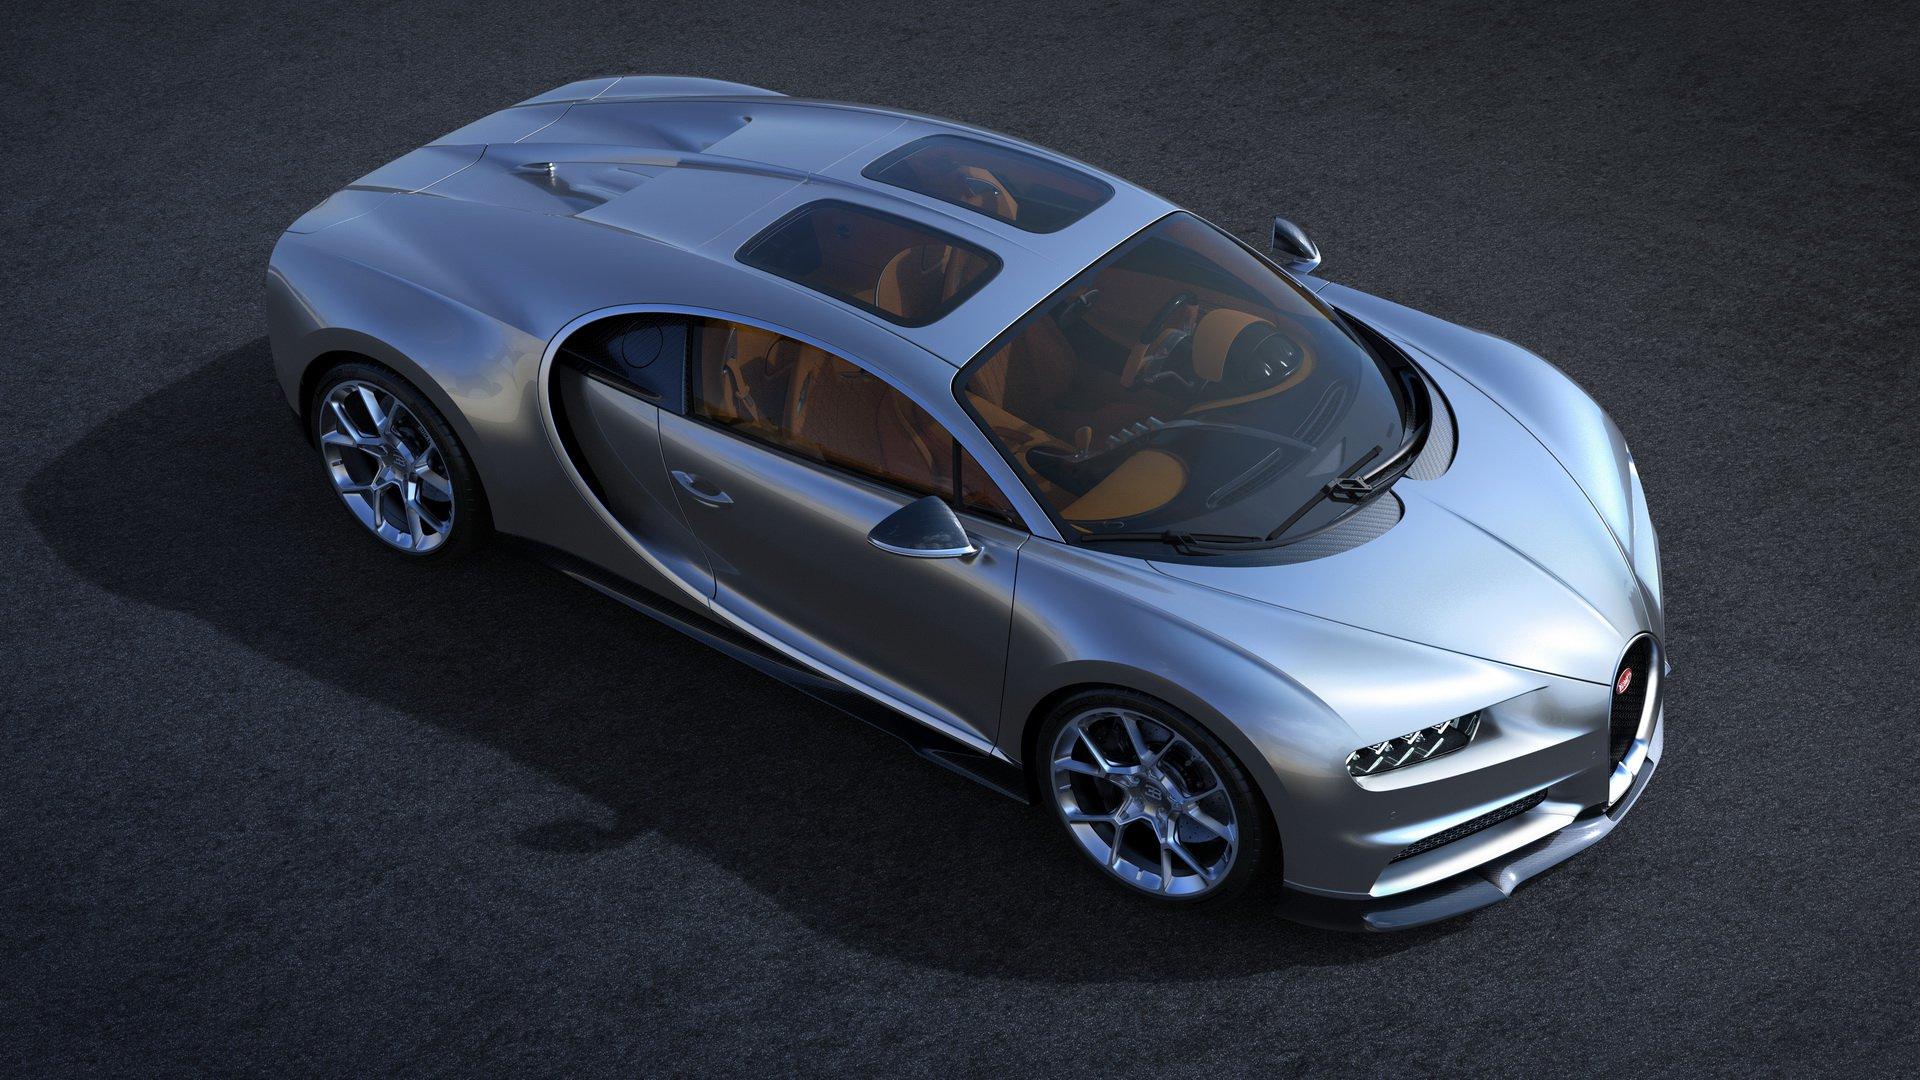 Bugatti Chiron Sky View glass roof (2)